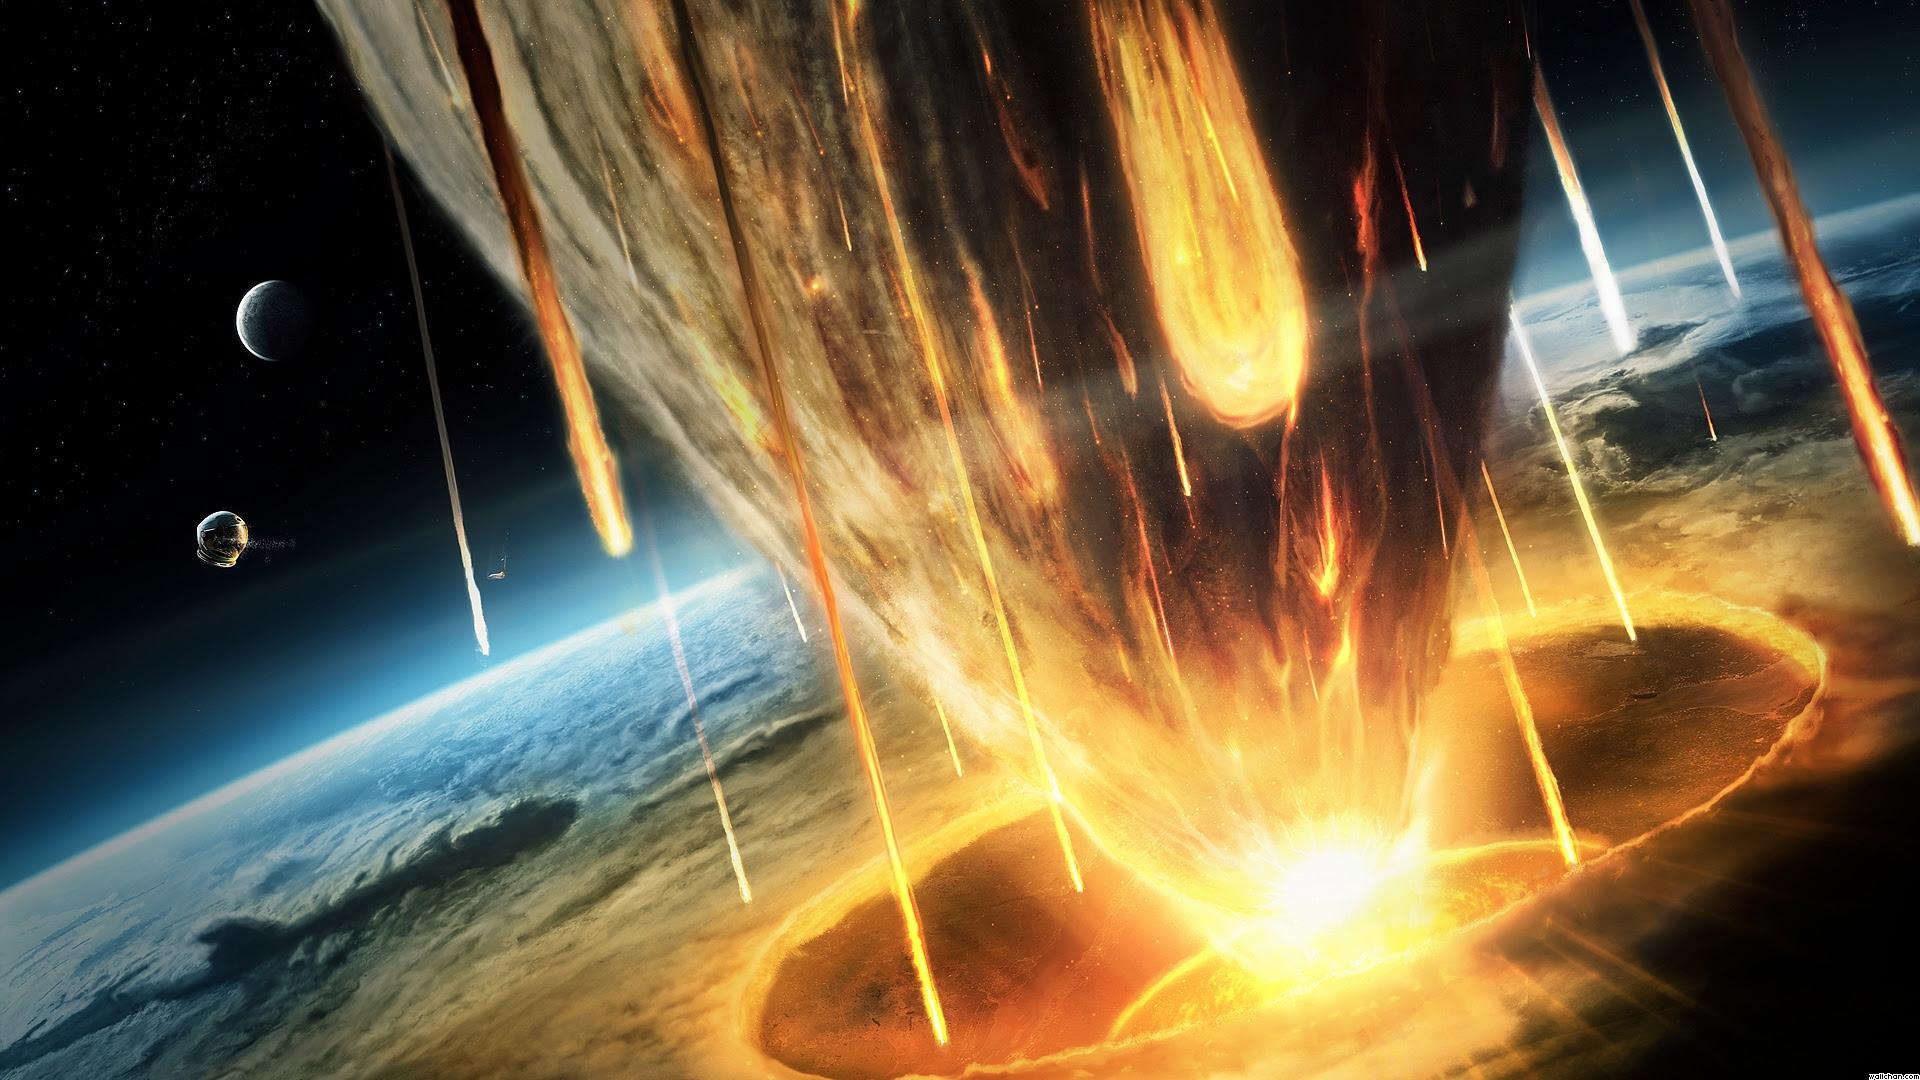 End Of The World Doomsday Destruction Wallpaper 30866067 Fanpop